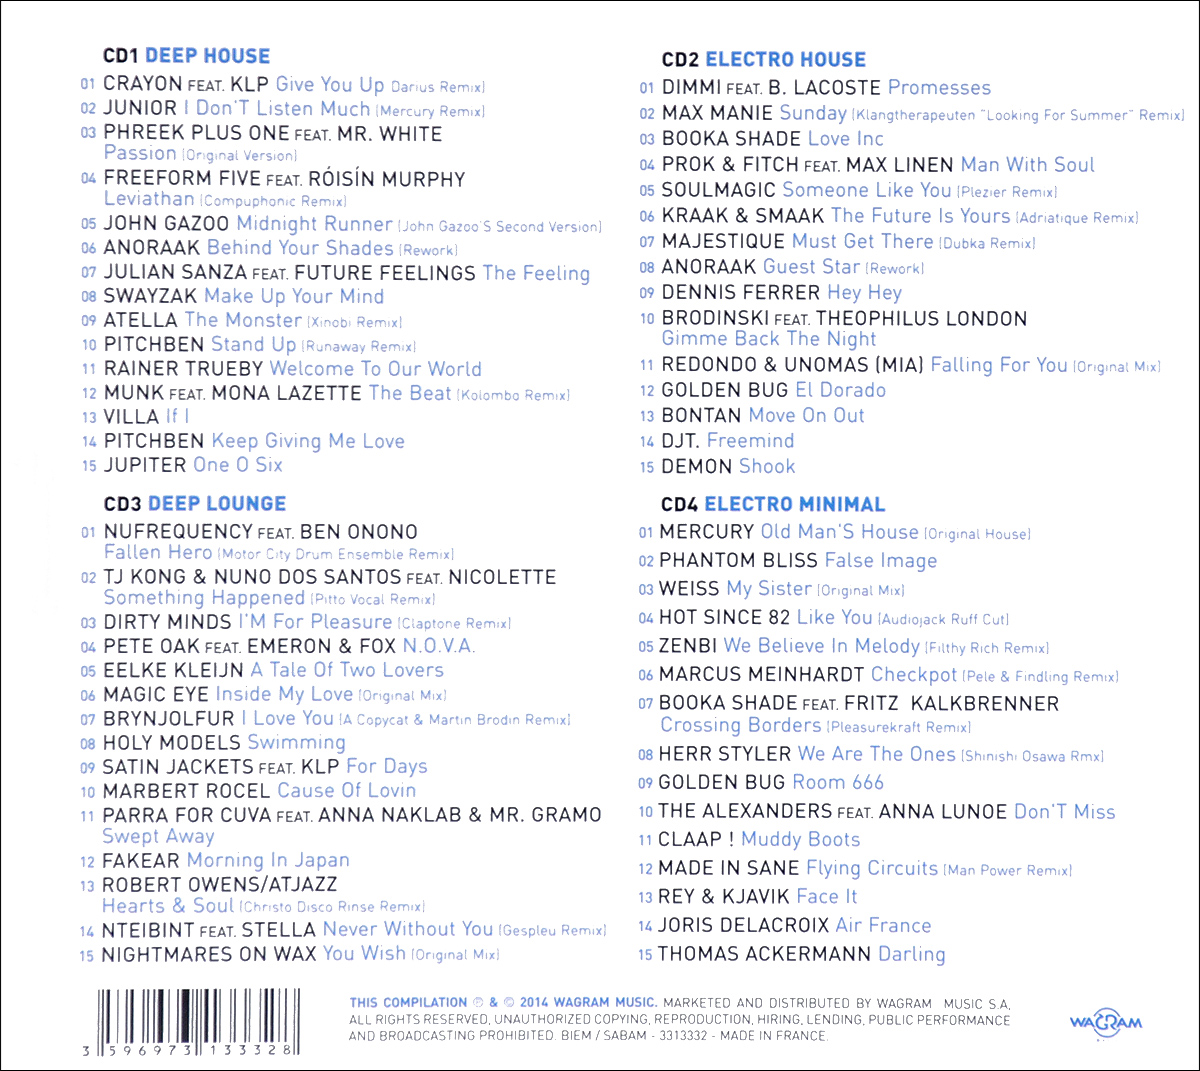 Spirit Of Deep Electro (4 CD) Traum Baum Records,Wagram Music